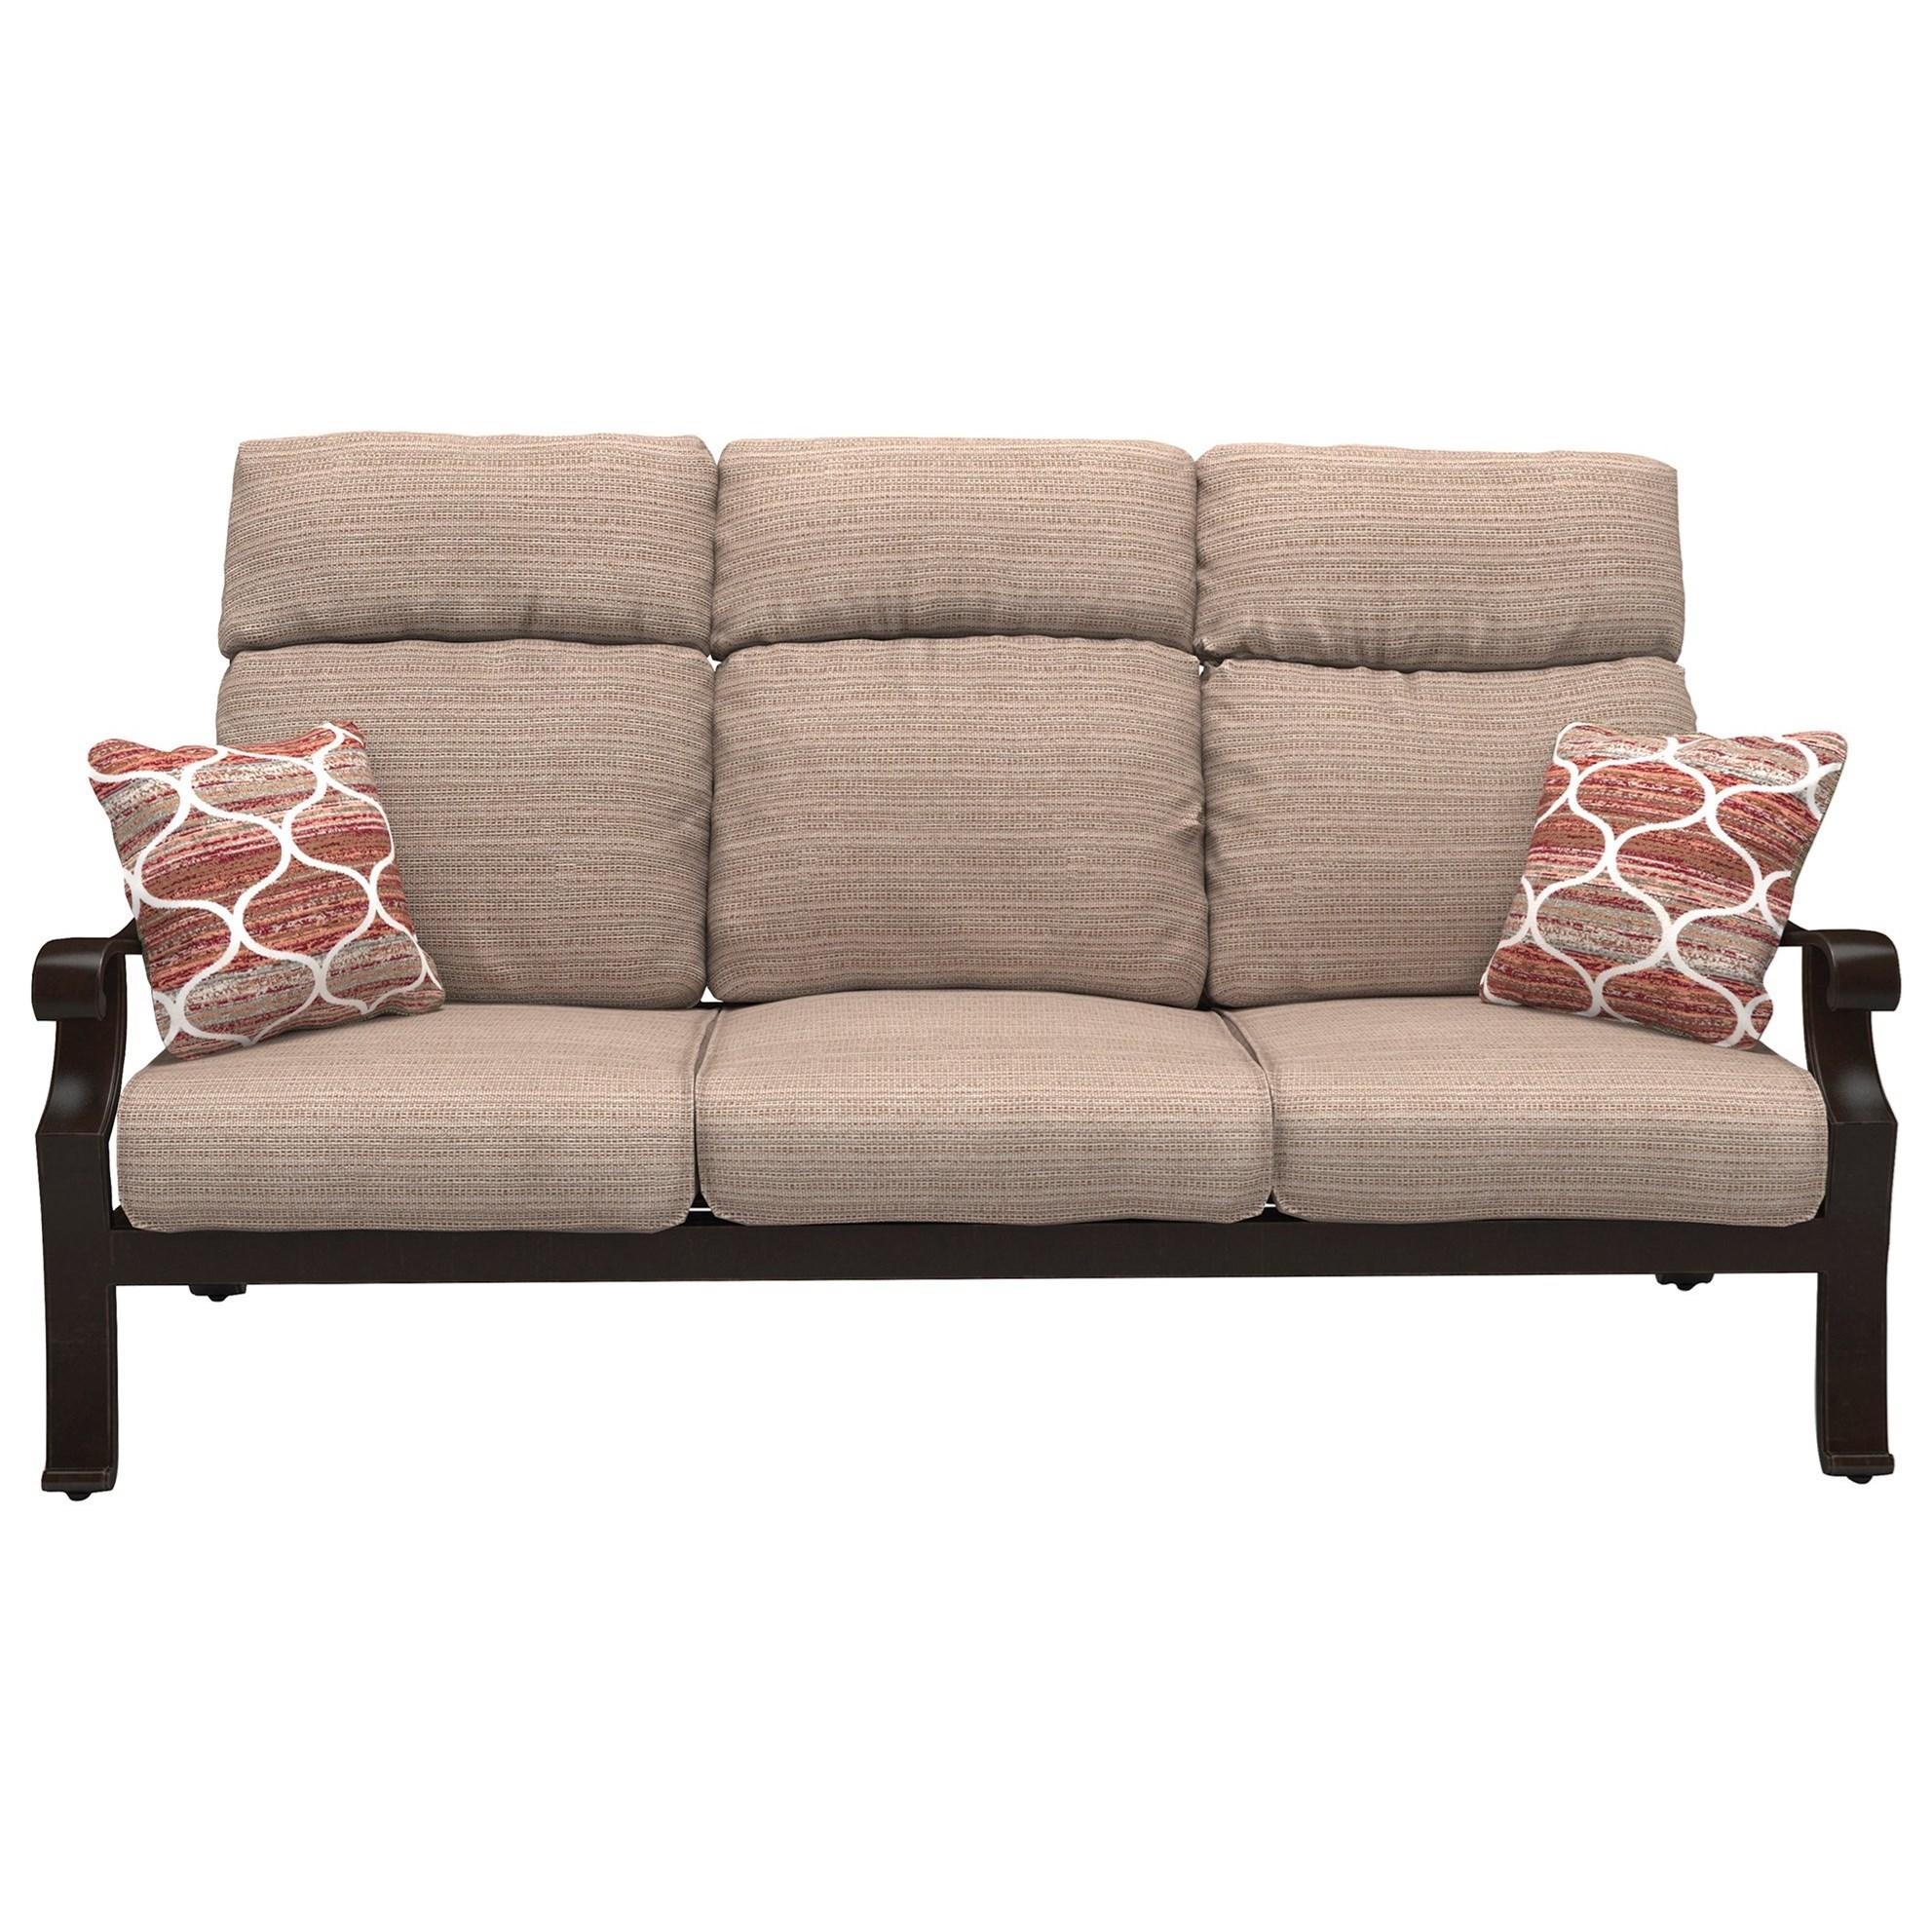 Signature Design By Ashley Chestnut Ridge High Back Sofa With Cushion